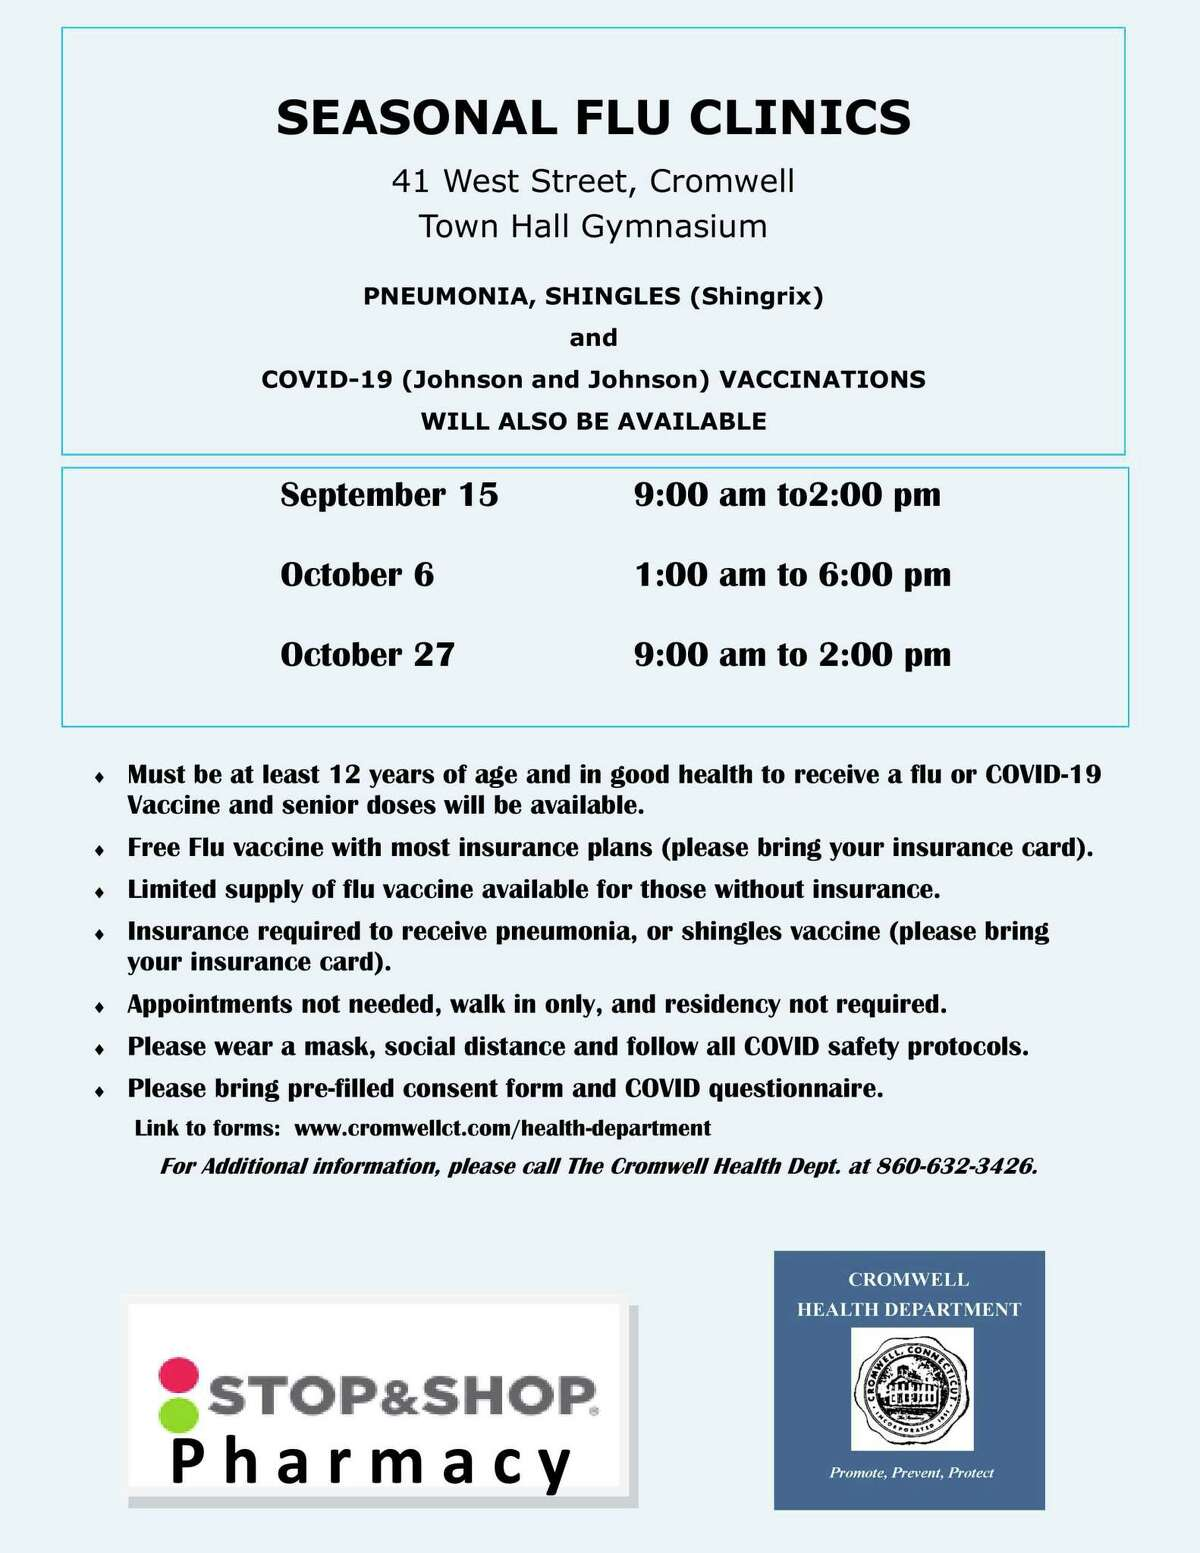 Fall flu clinics are beginning in Cromwell.